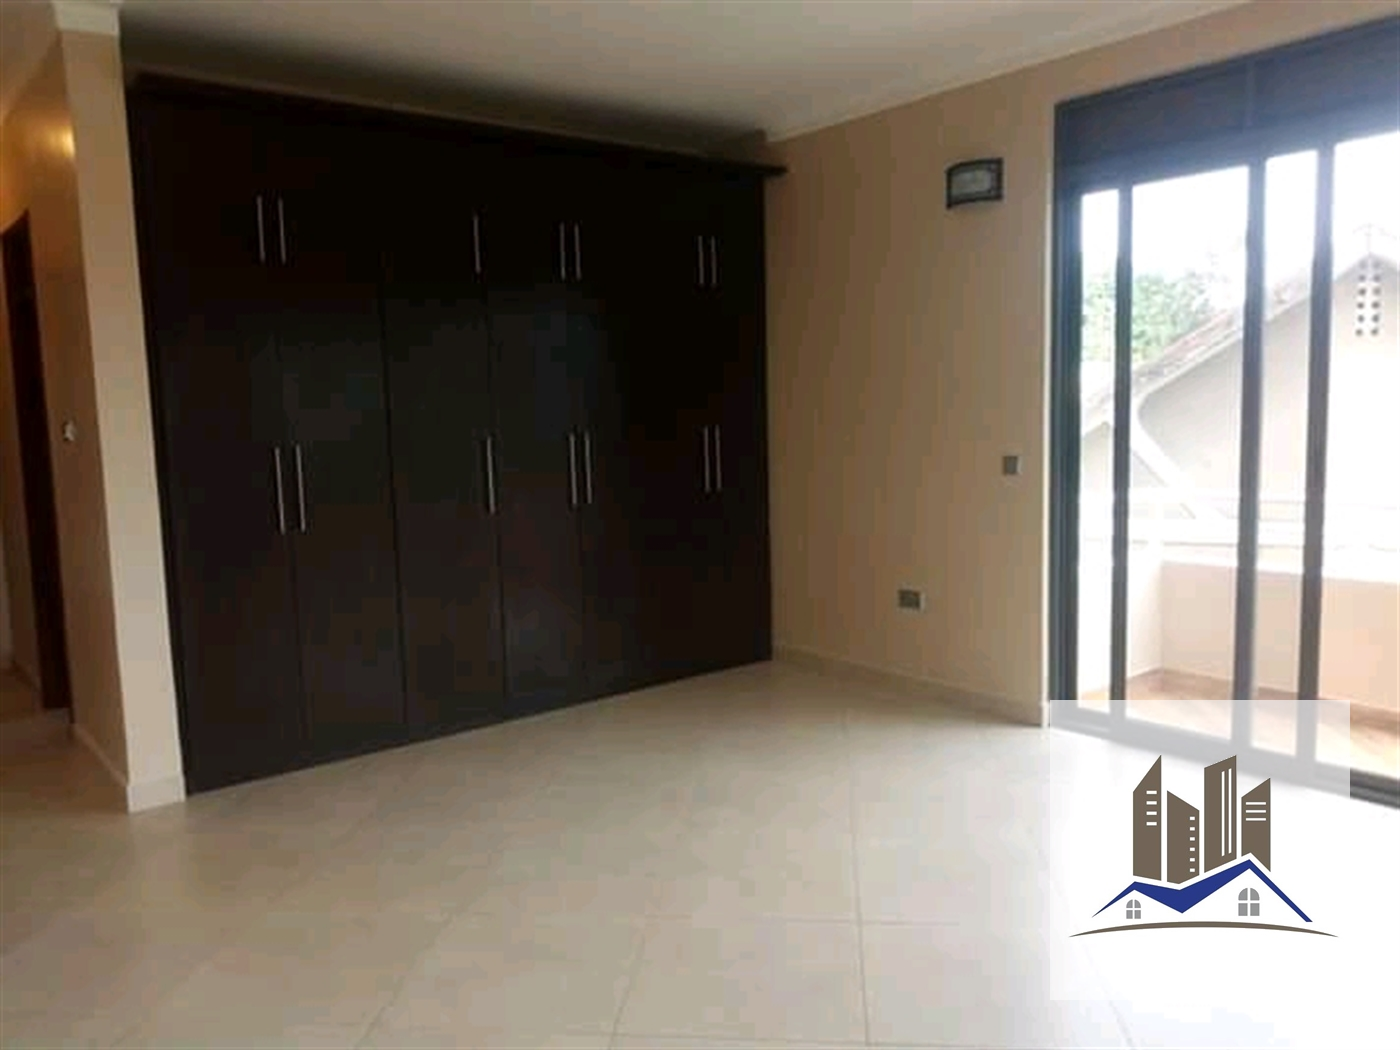 Apartment block for sale in Luzira Kampala